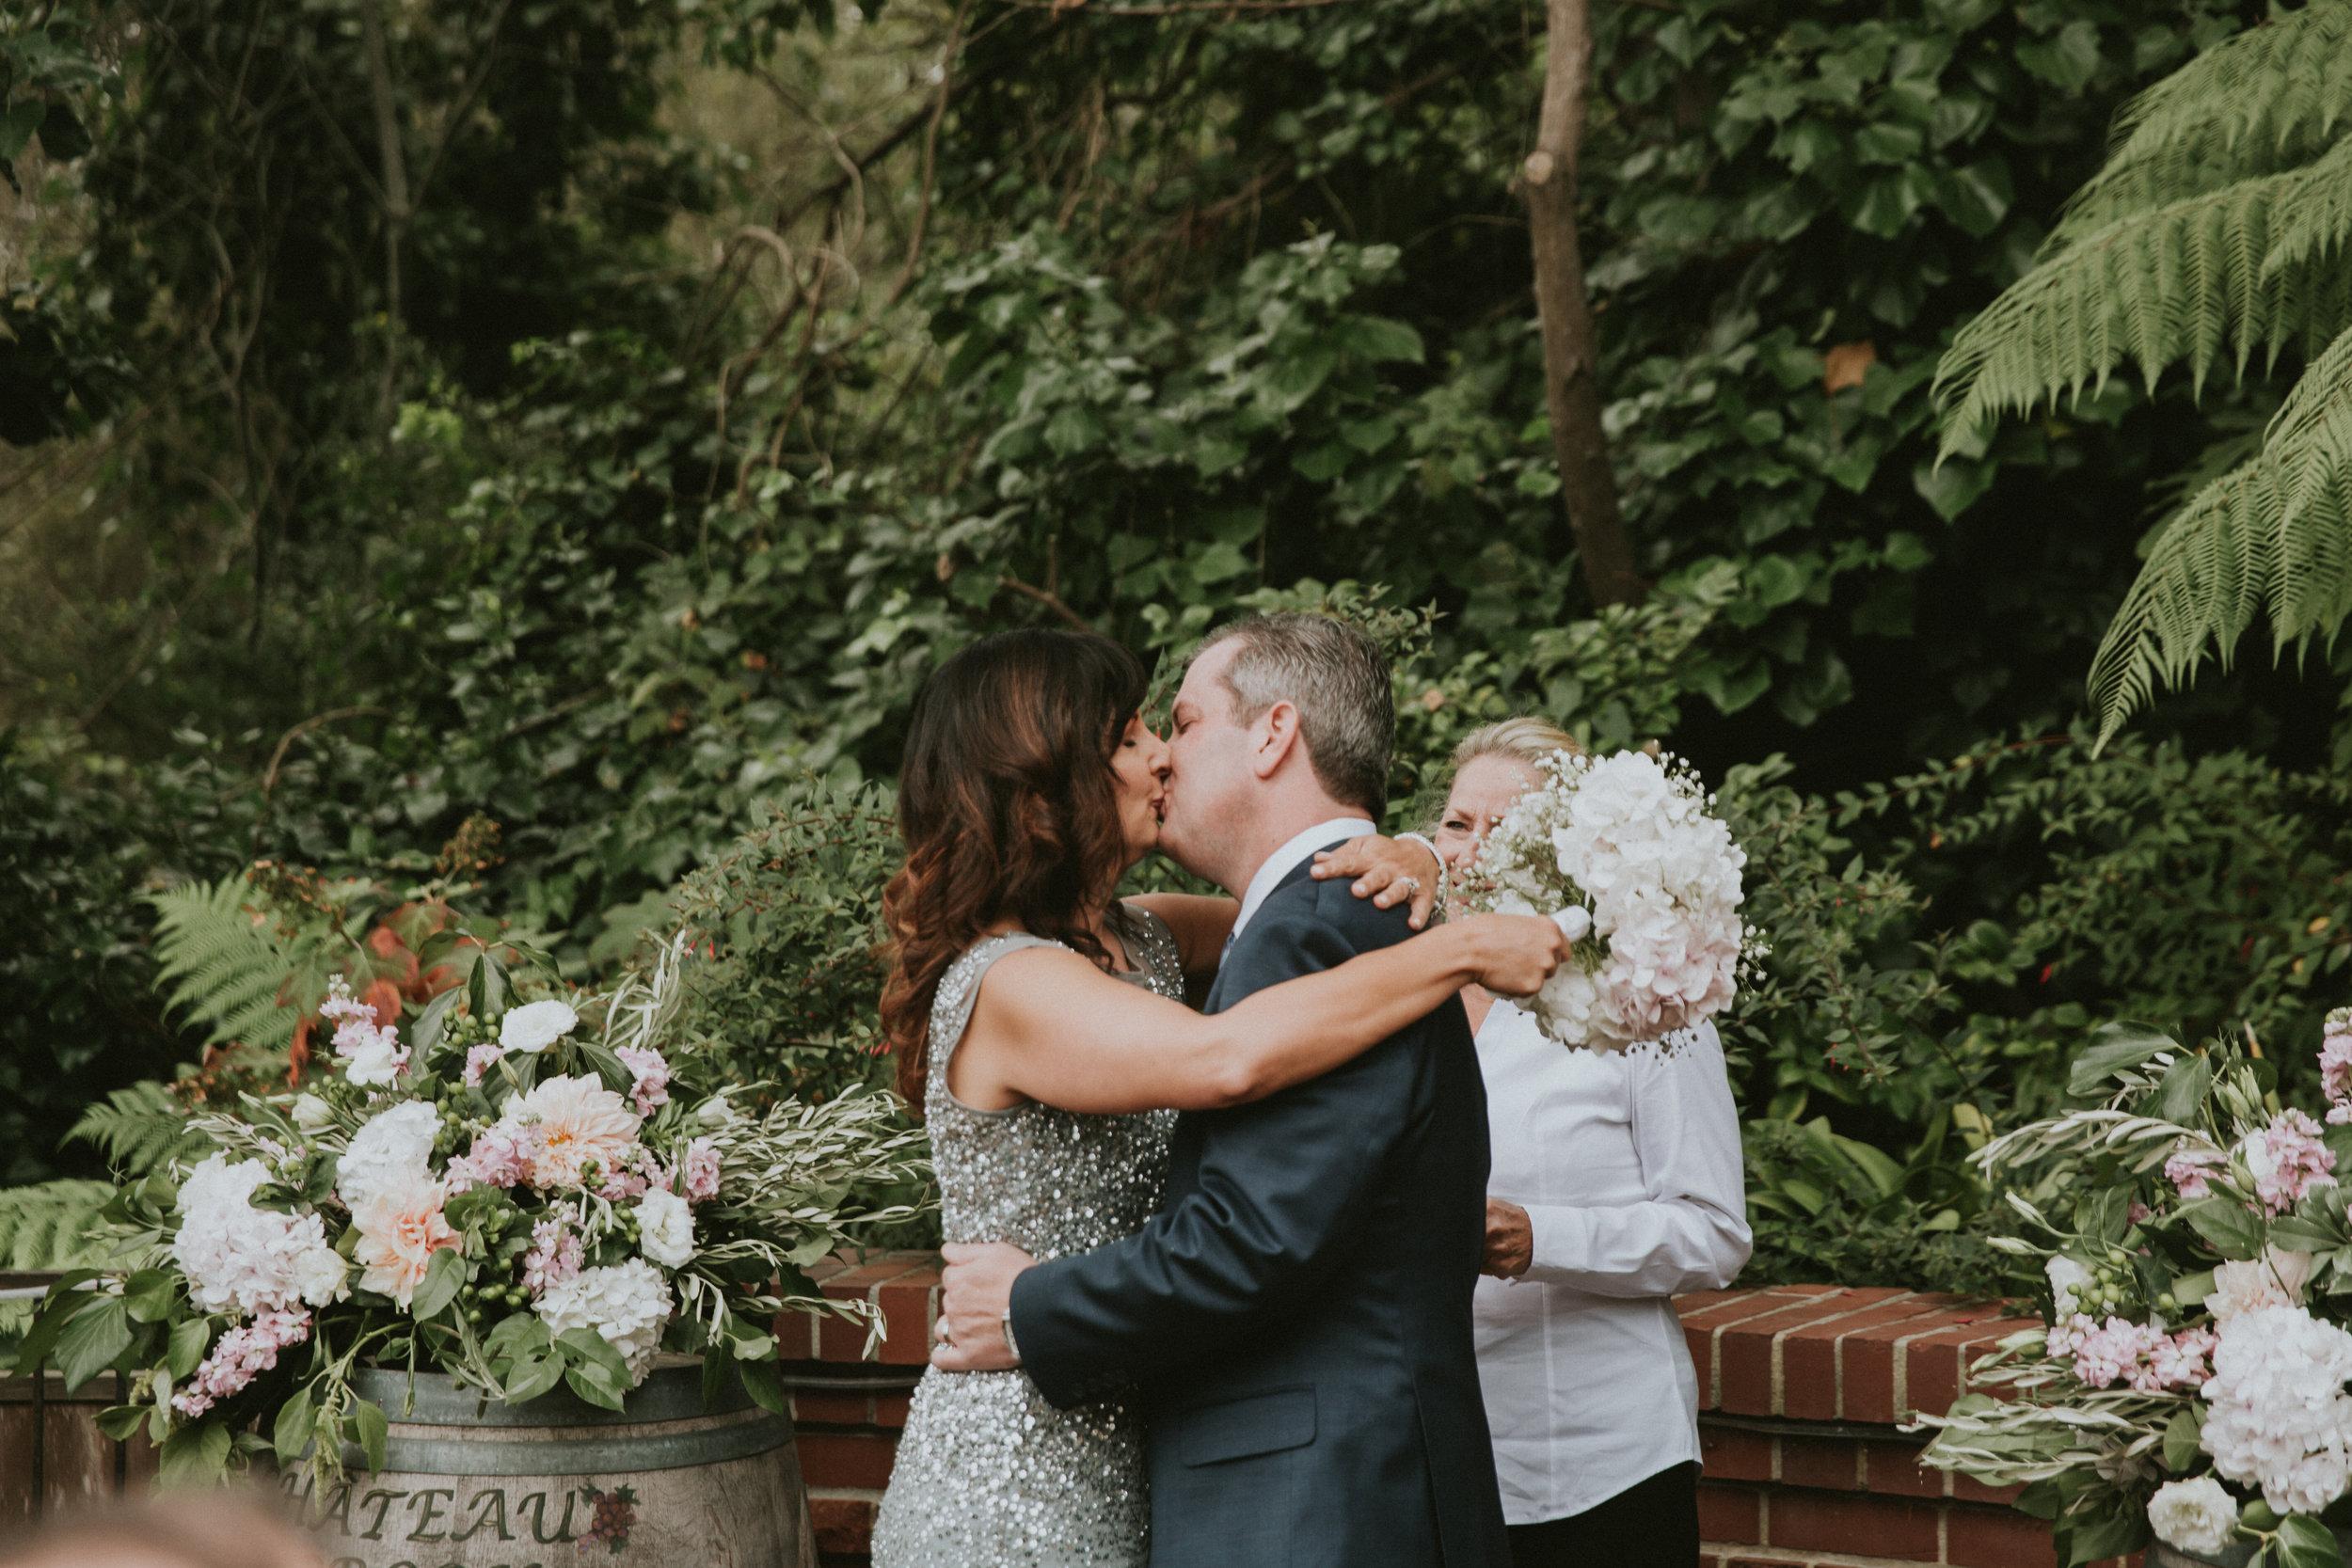 Capitola-Santa-Cruz-wedding-photographer-206.jpg